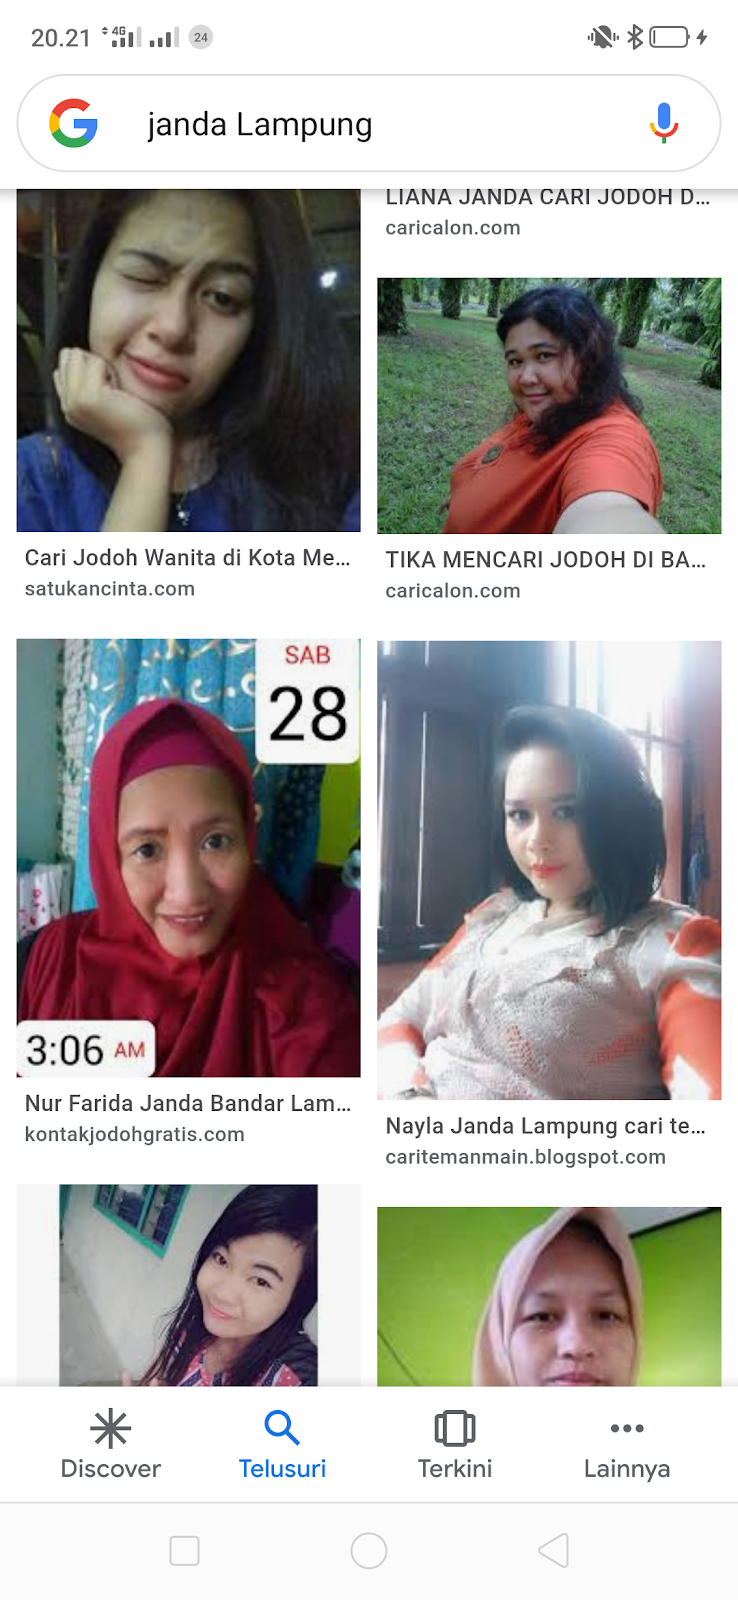 Cari Jodoh Janda Lampung Cantik Manis Sexy